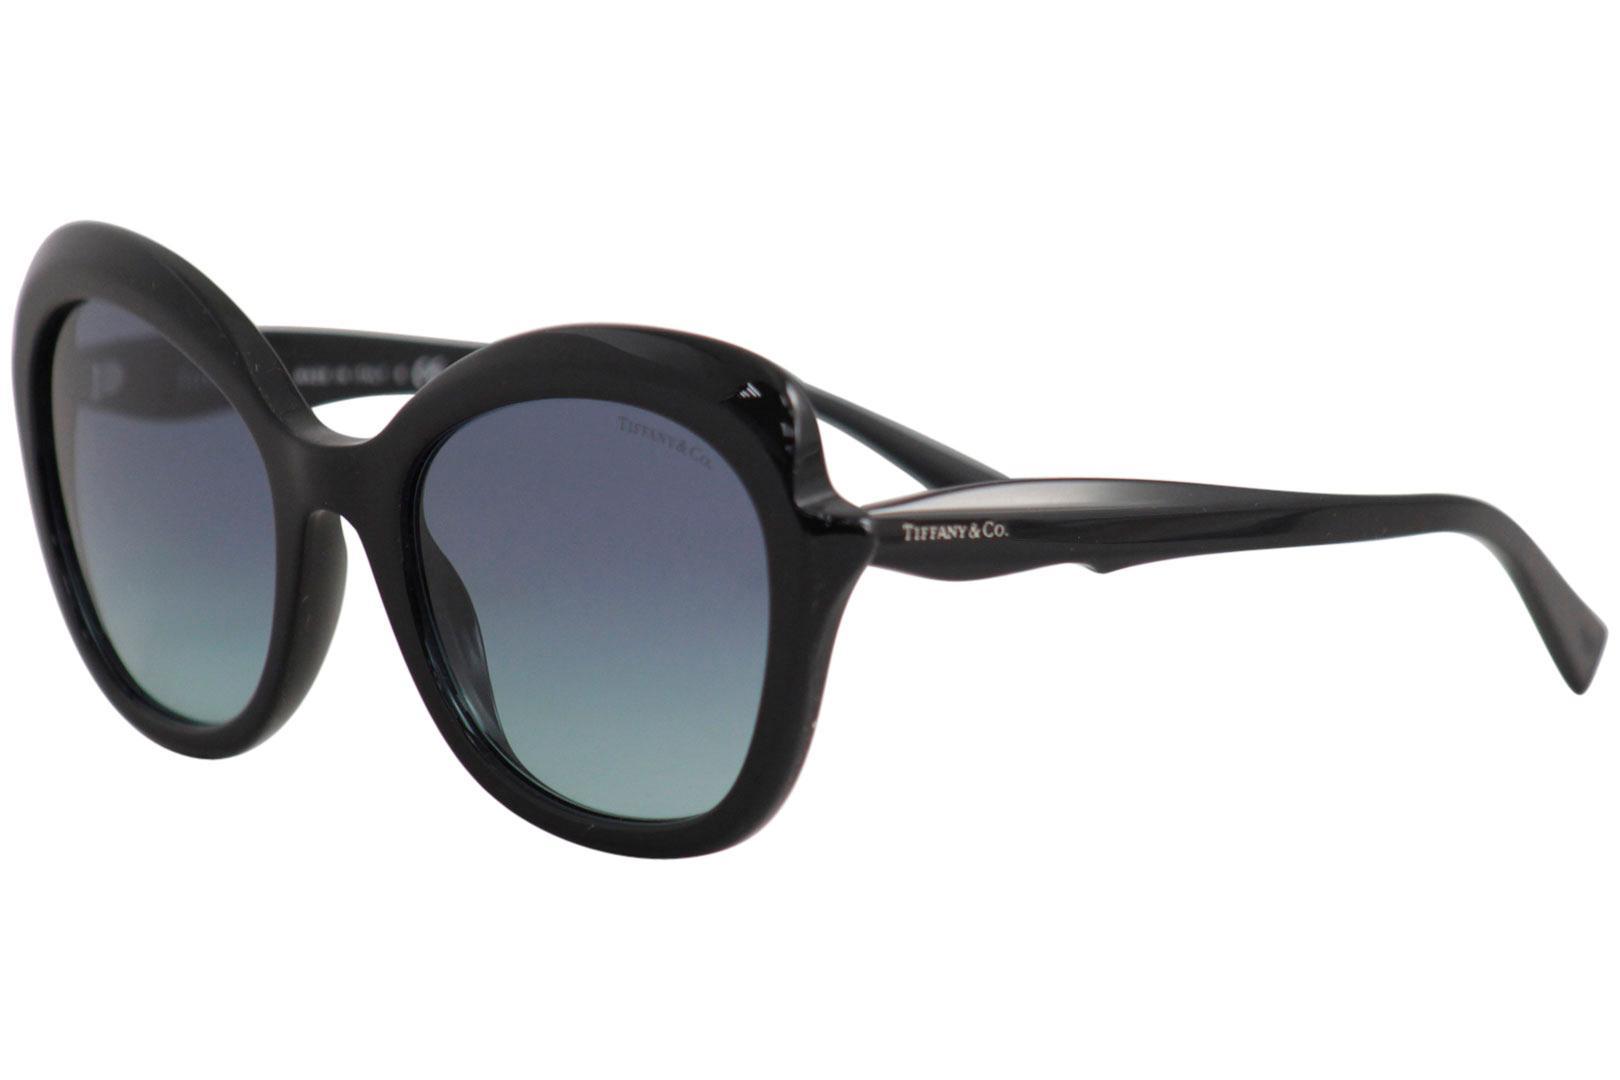 c5c1d1c4b86ca Tiffany   Co. Women s TF4154 TF 4154 Fashion Cat Eye Sunglasses by Tiffany    Co.